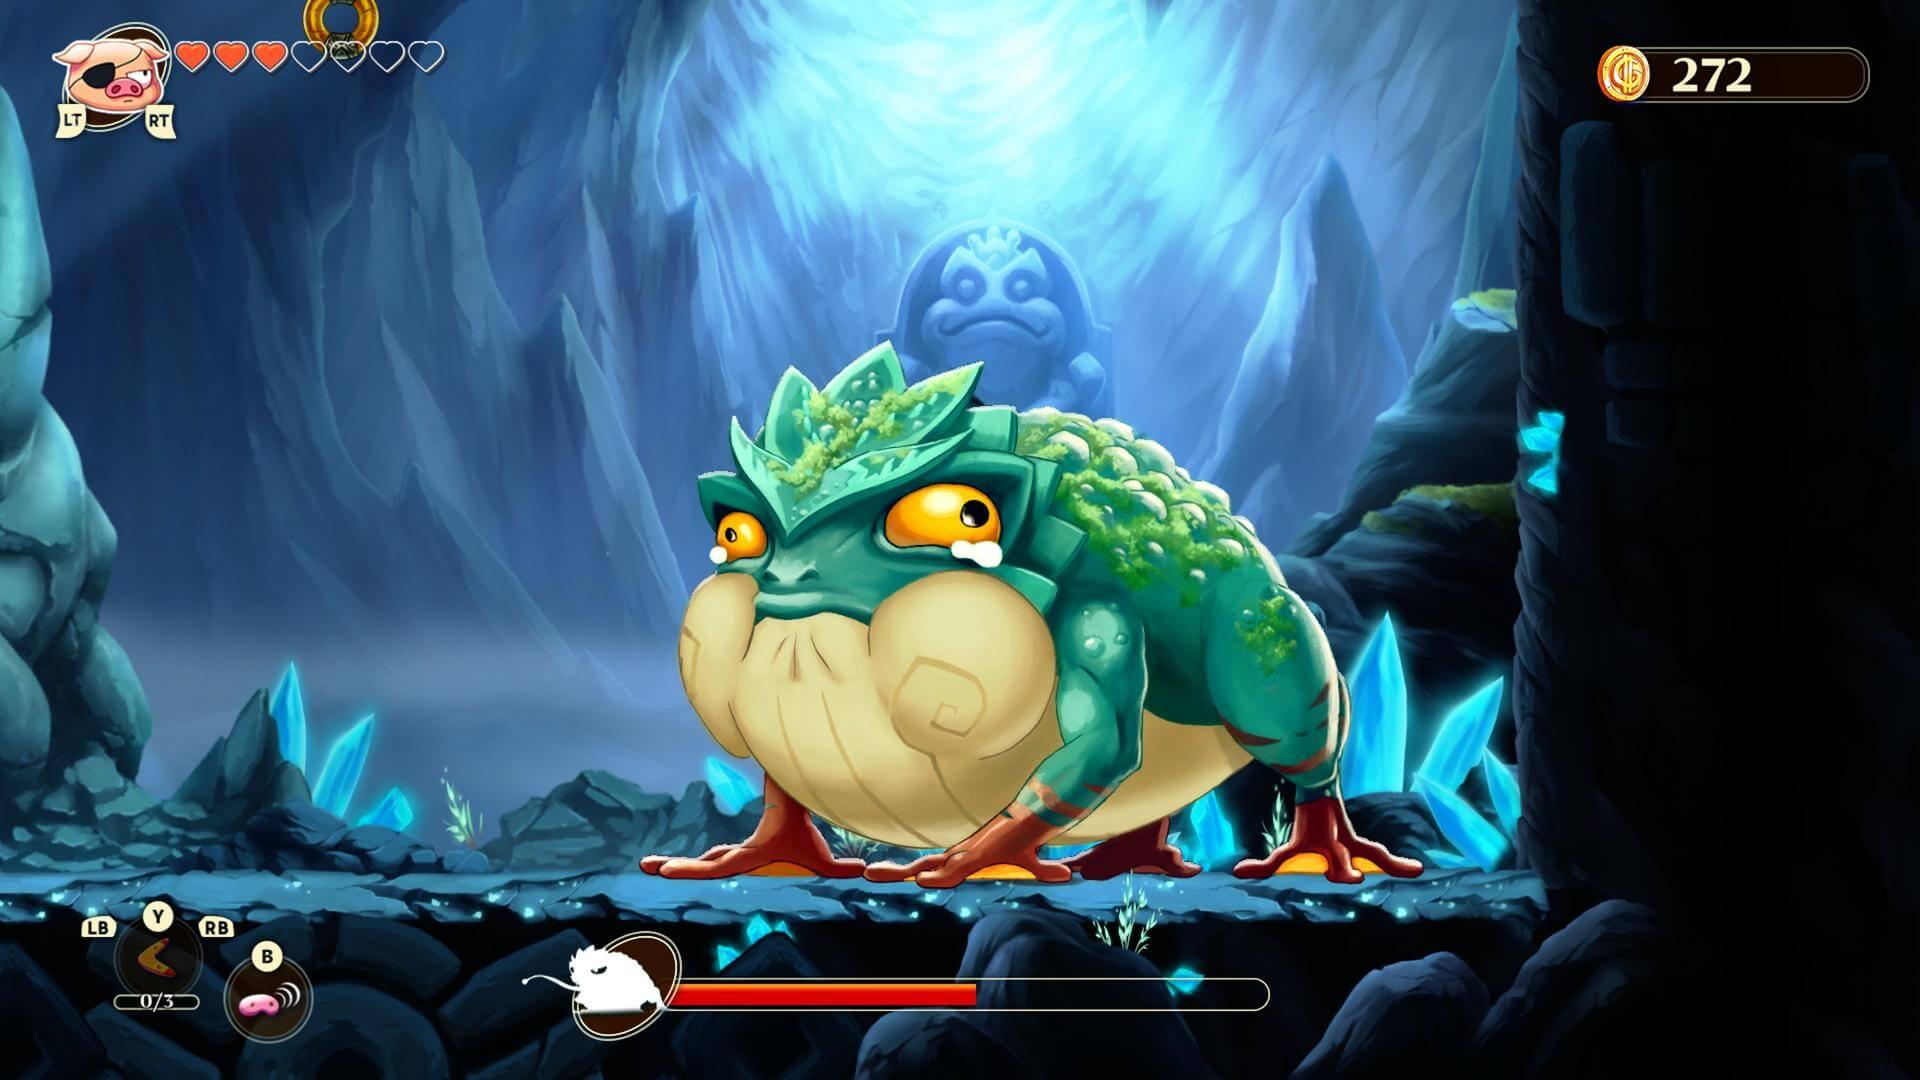 Monster Boy and the Cursed Kingdom, Monster Boy, Wonder Boy, Delfos